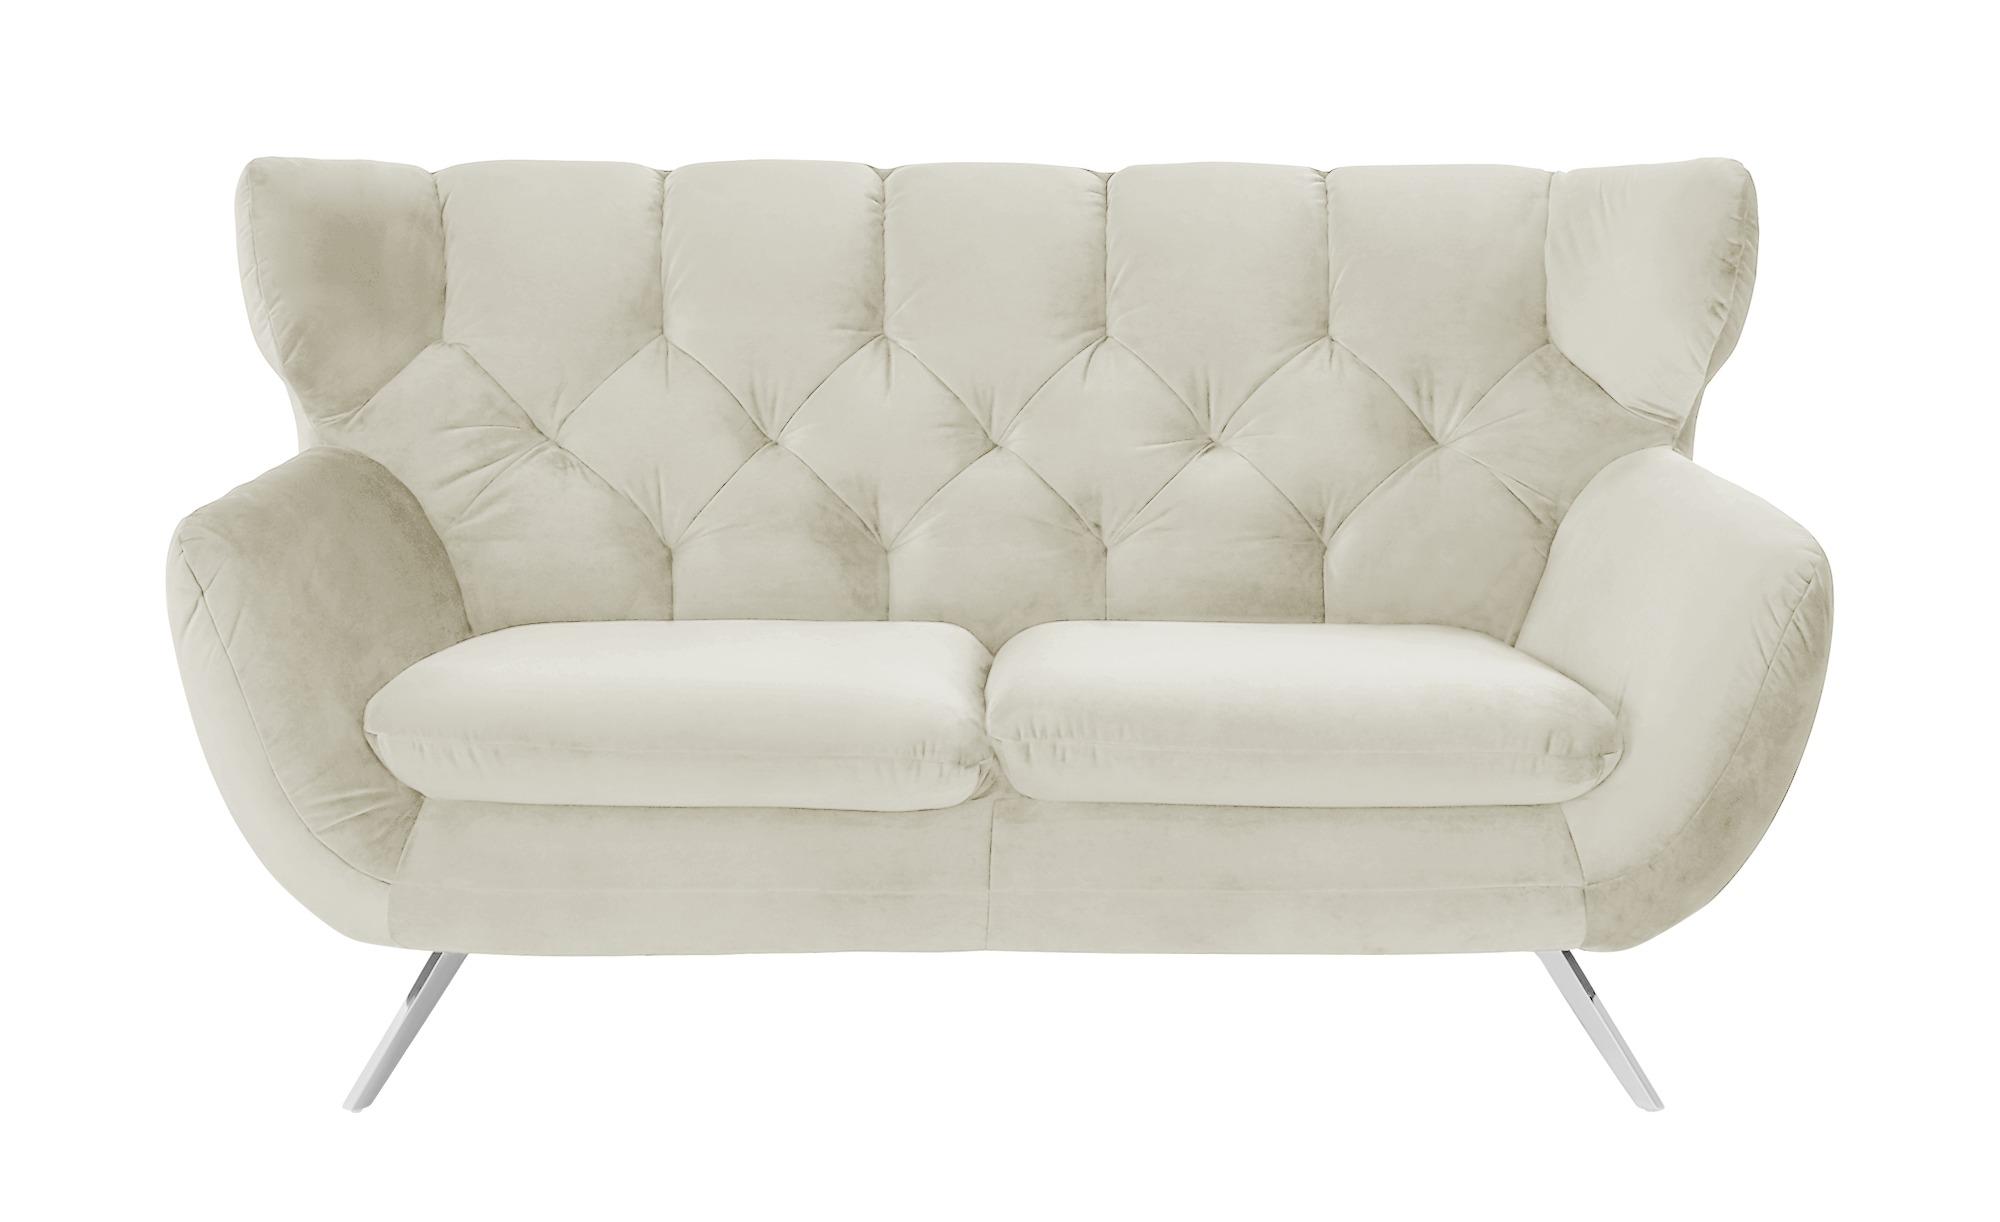 Sofa  Caldara ¦ creme ¦ Maße (cm): B: 175 H: 94 T: 95 Polstermöbel > Sofas > 2-Sitzer - Höffner